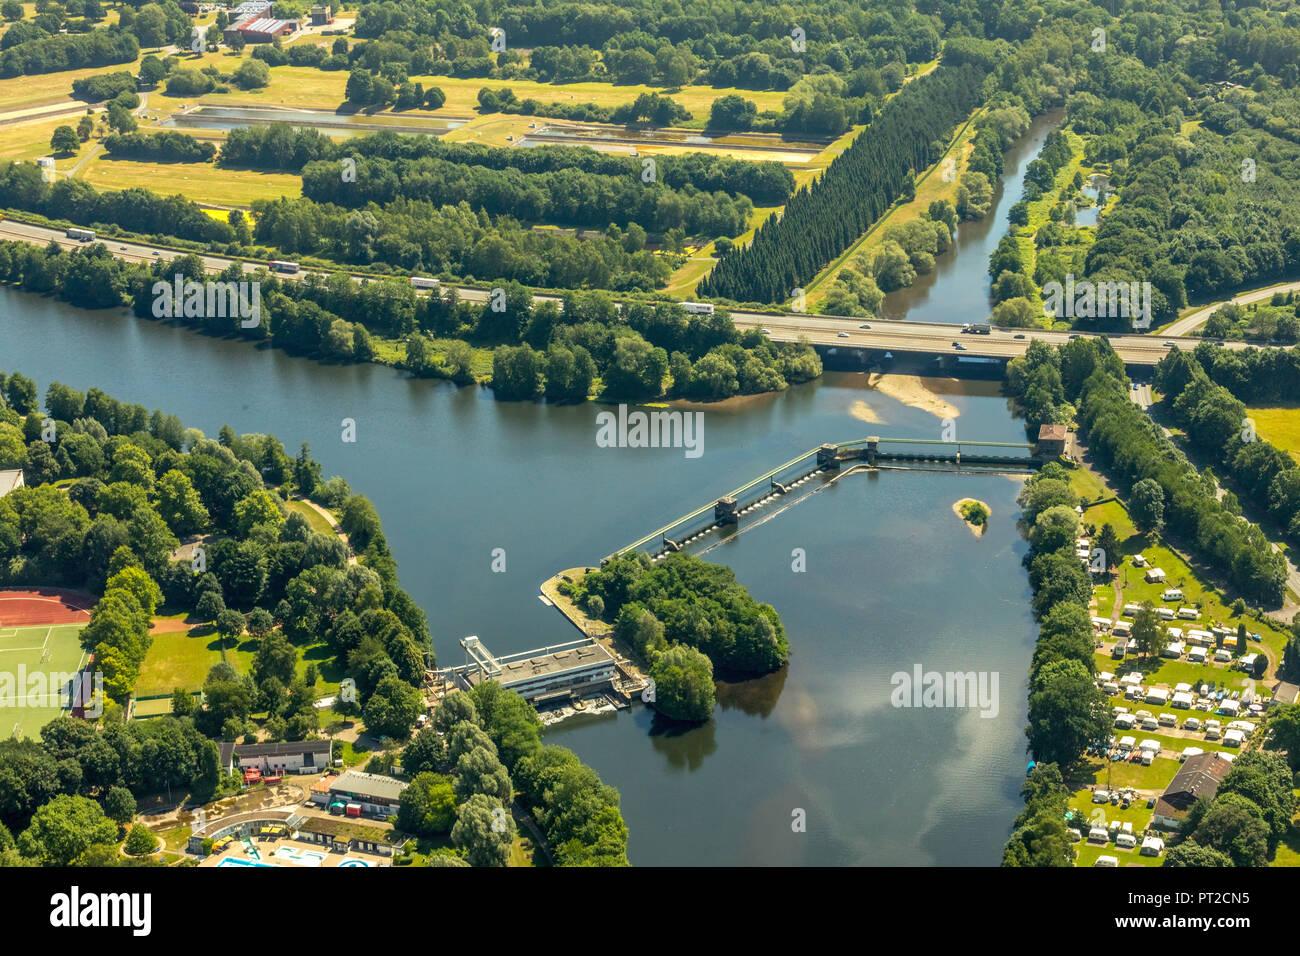 Bleichstein and Volme estuary, Ruhr, Ruhr valley, Herdecke, Ruhr area, North Rhine-Westphalia, Germany - Stock Image